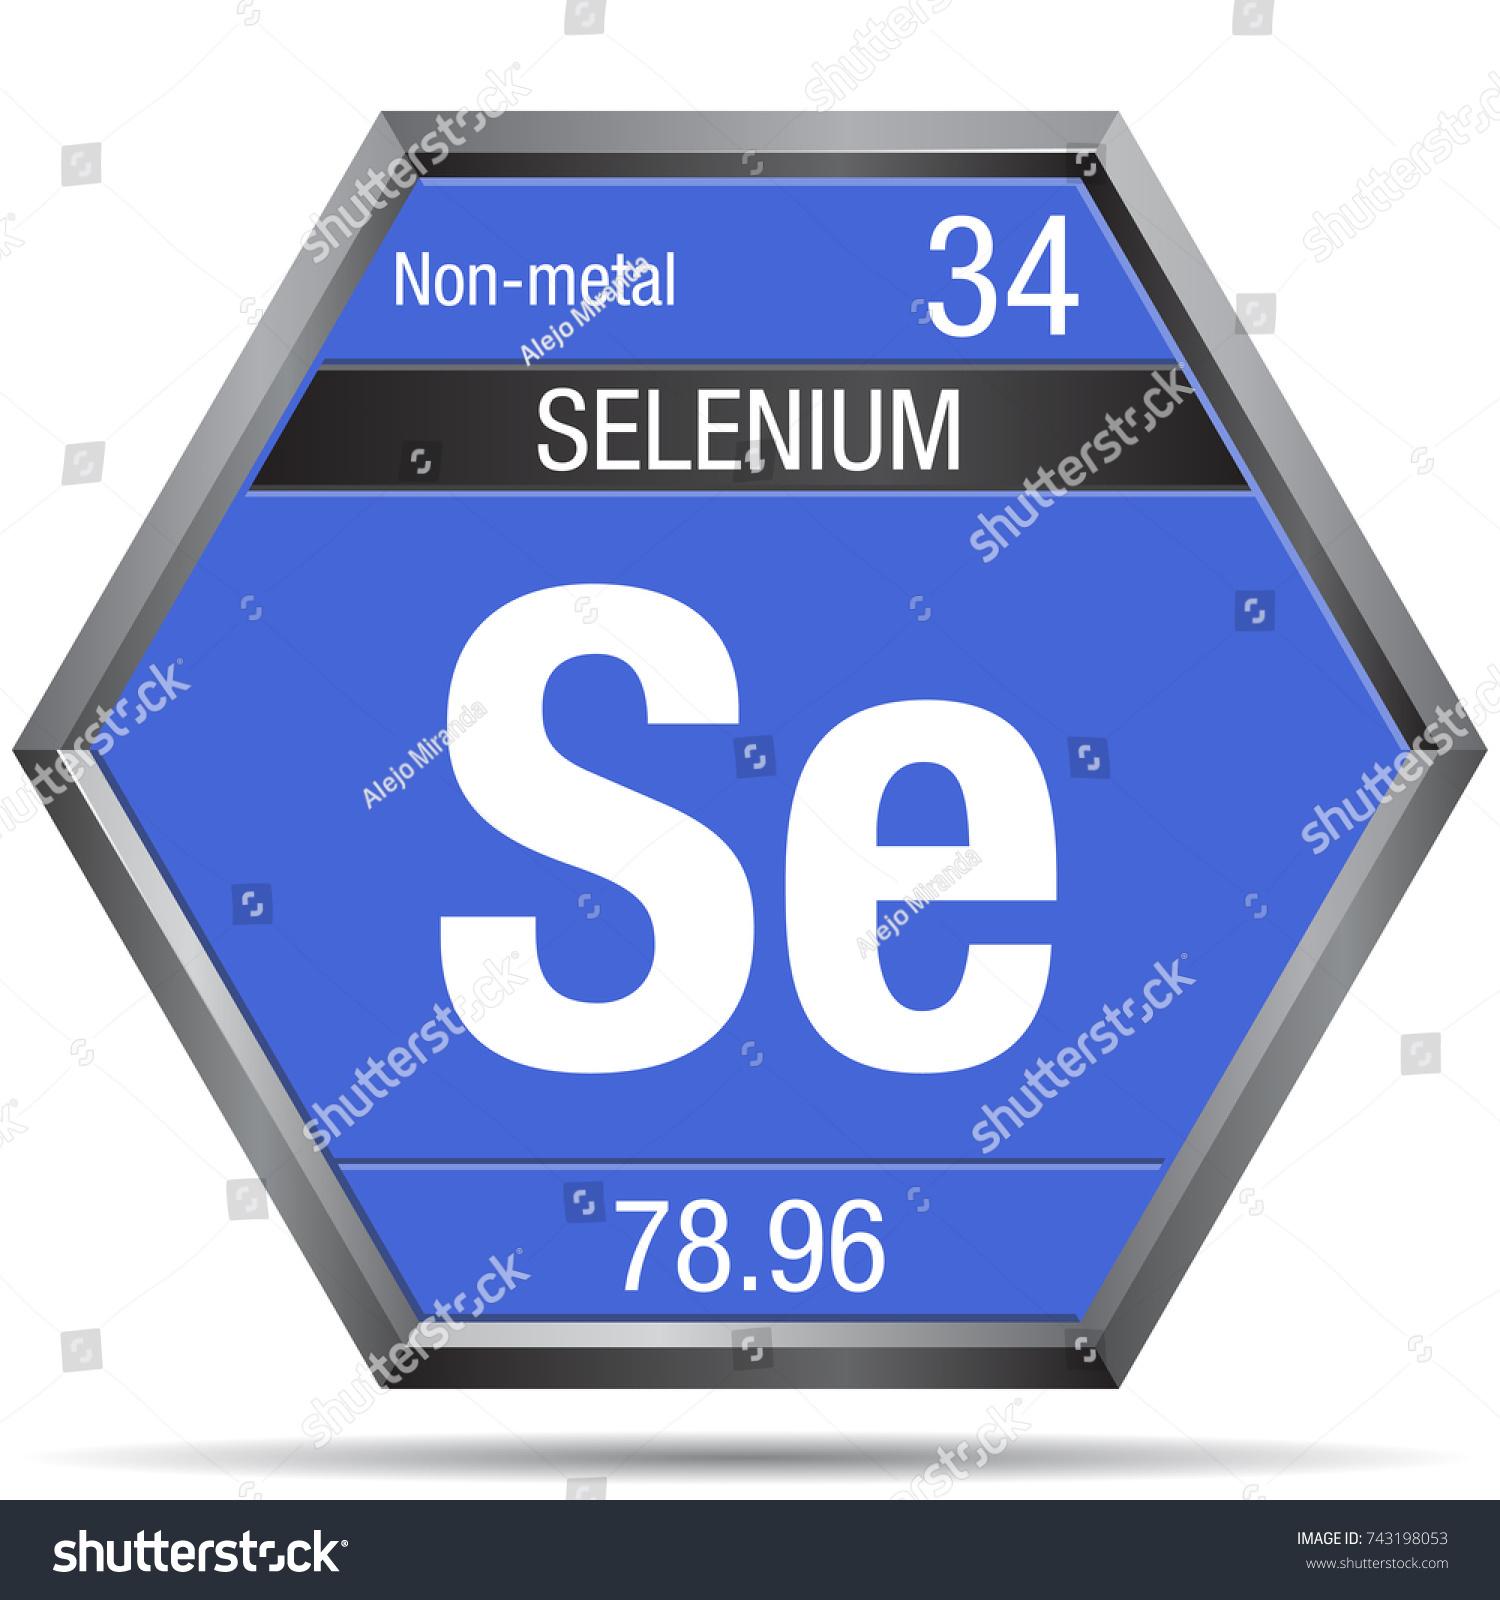 Selenium symbol form hexagon metallic frame stock vector 743198053 selenium symbol in the form of a hexagon with a metallic frame element number 34 buycottarizona